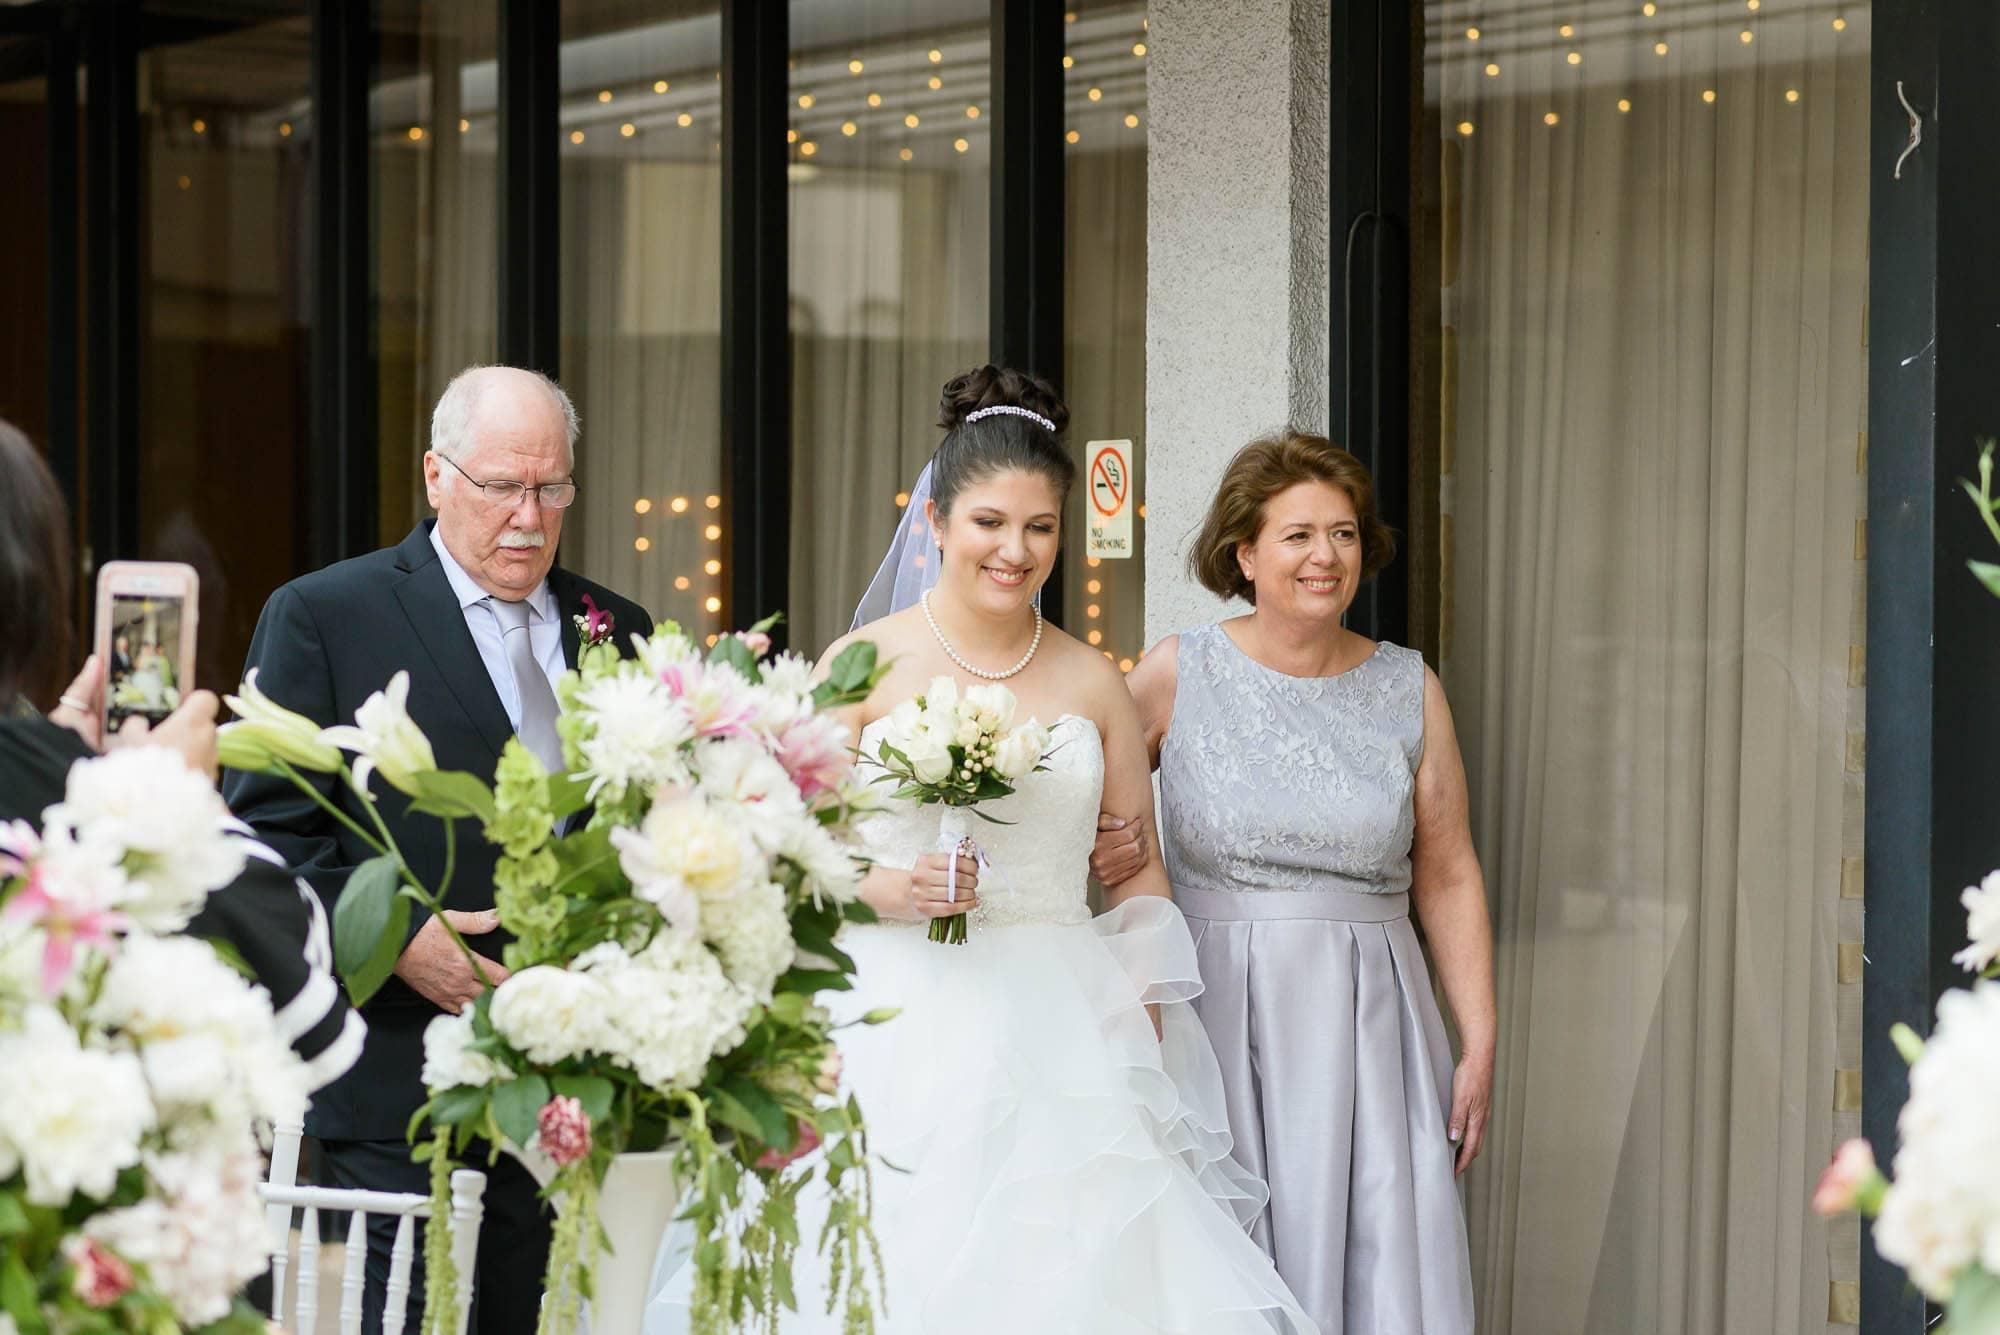 018_Alan_and_Heidi_Wedding_Nicole_Roman